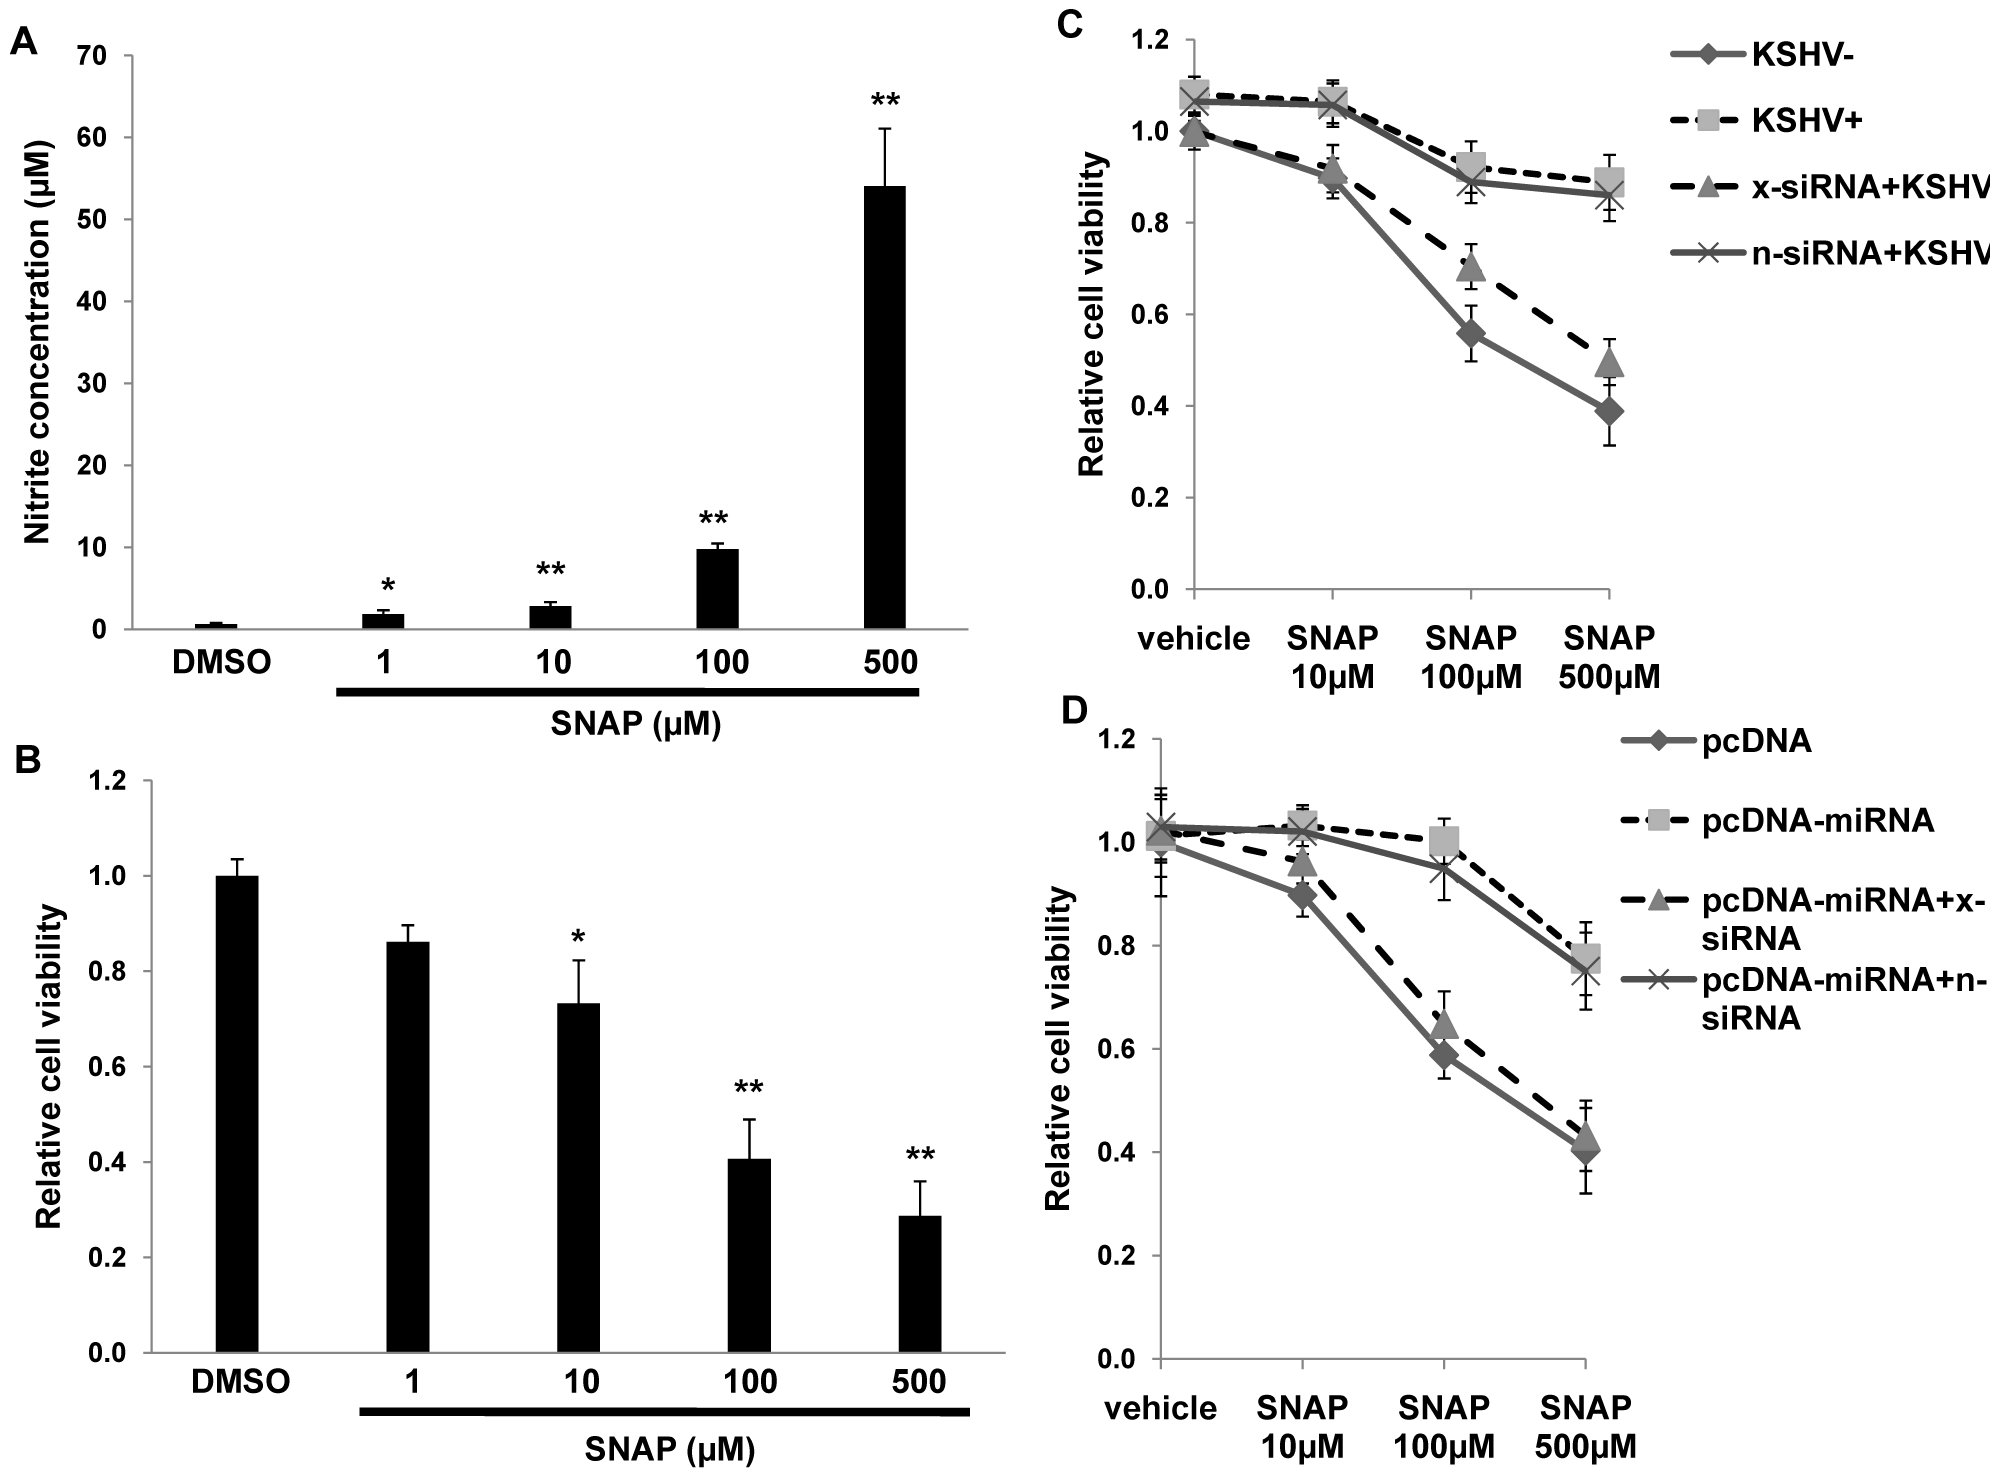 KSHV miRNAs enhance macrophage survival in an environment of oxidative stress through the upregulation of xCT.